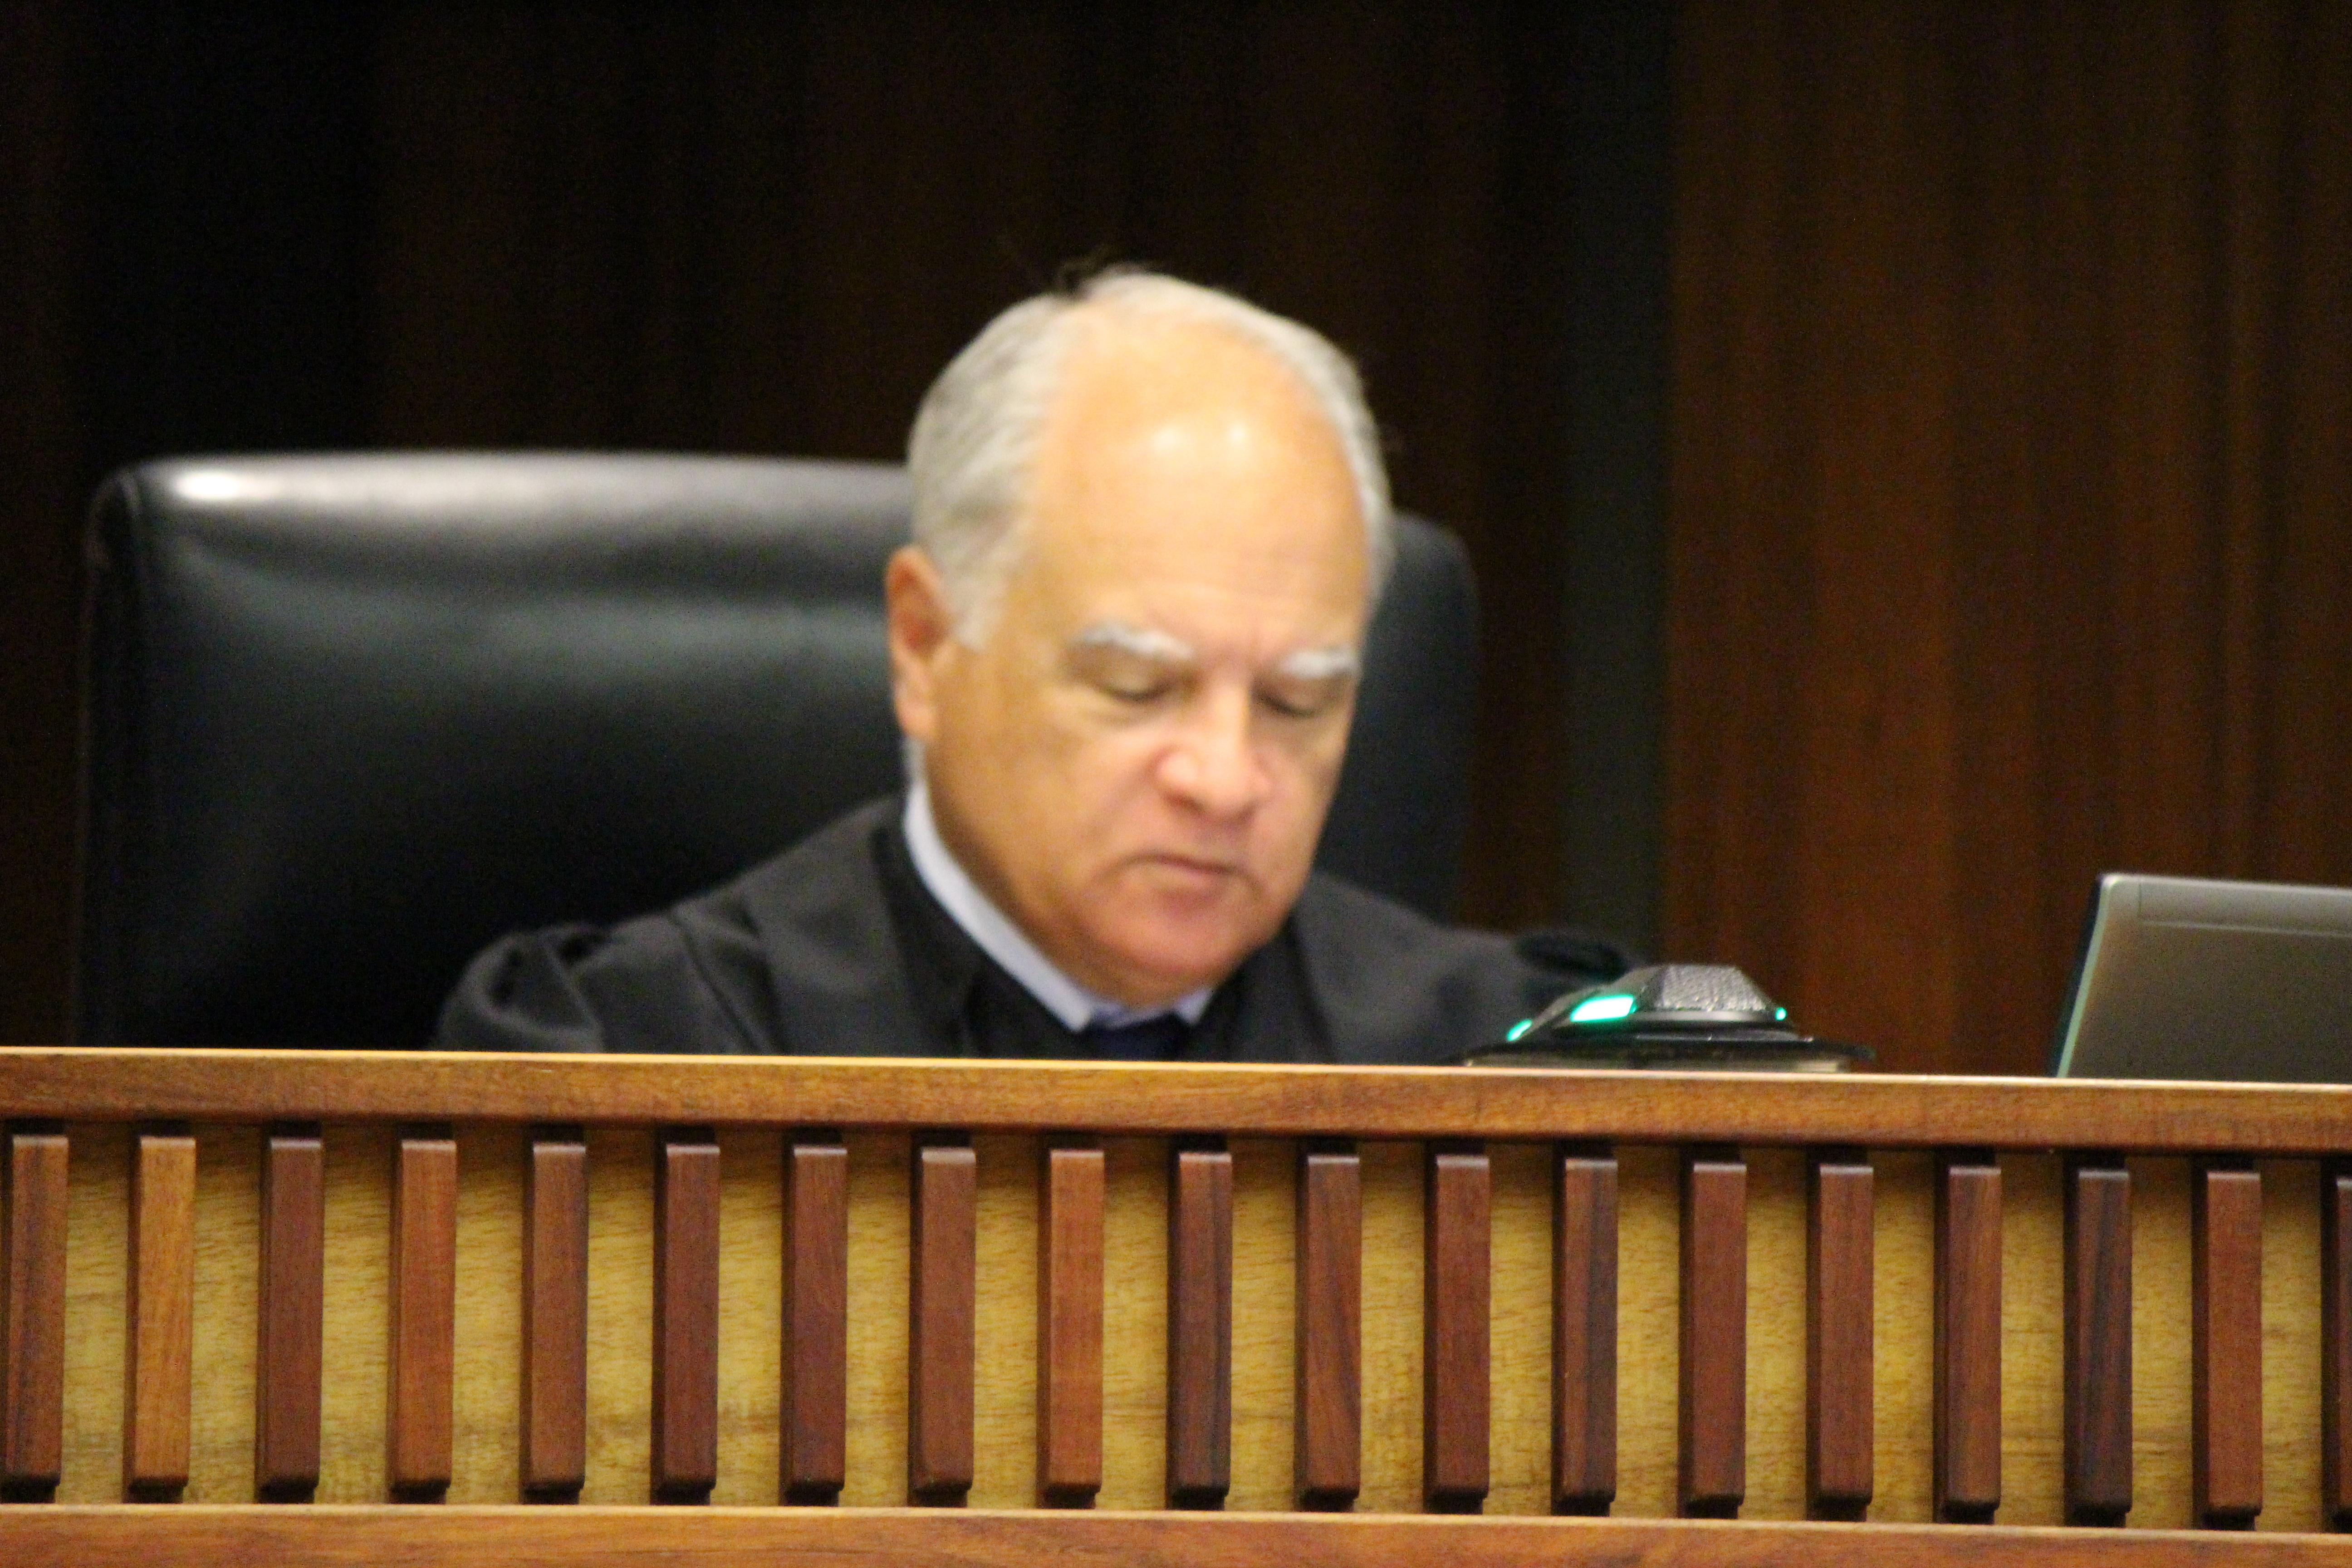 Maui Chief Judge Joseph Cardoza. PC 11.29.16 by Wendy Osher.